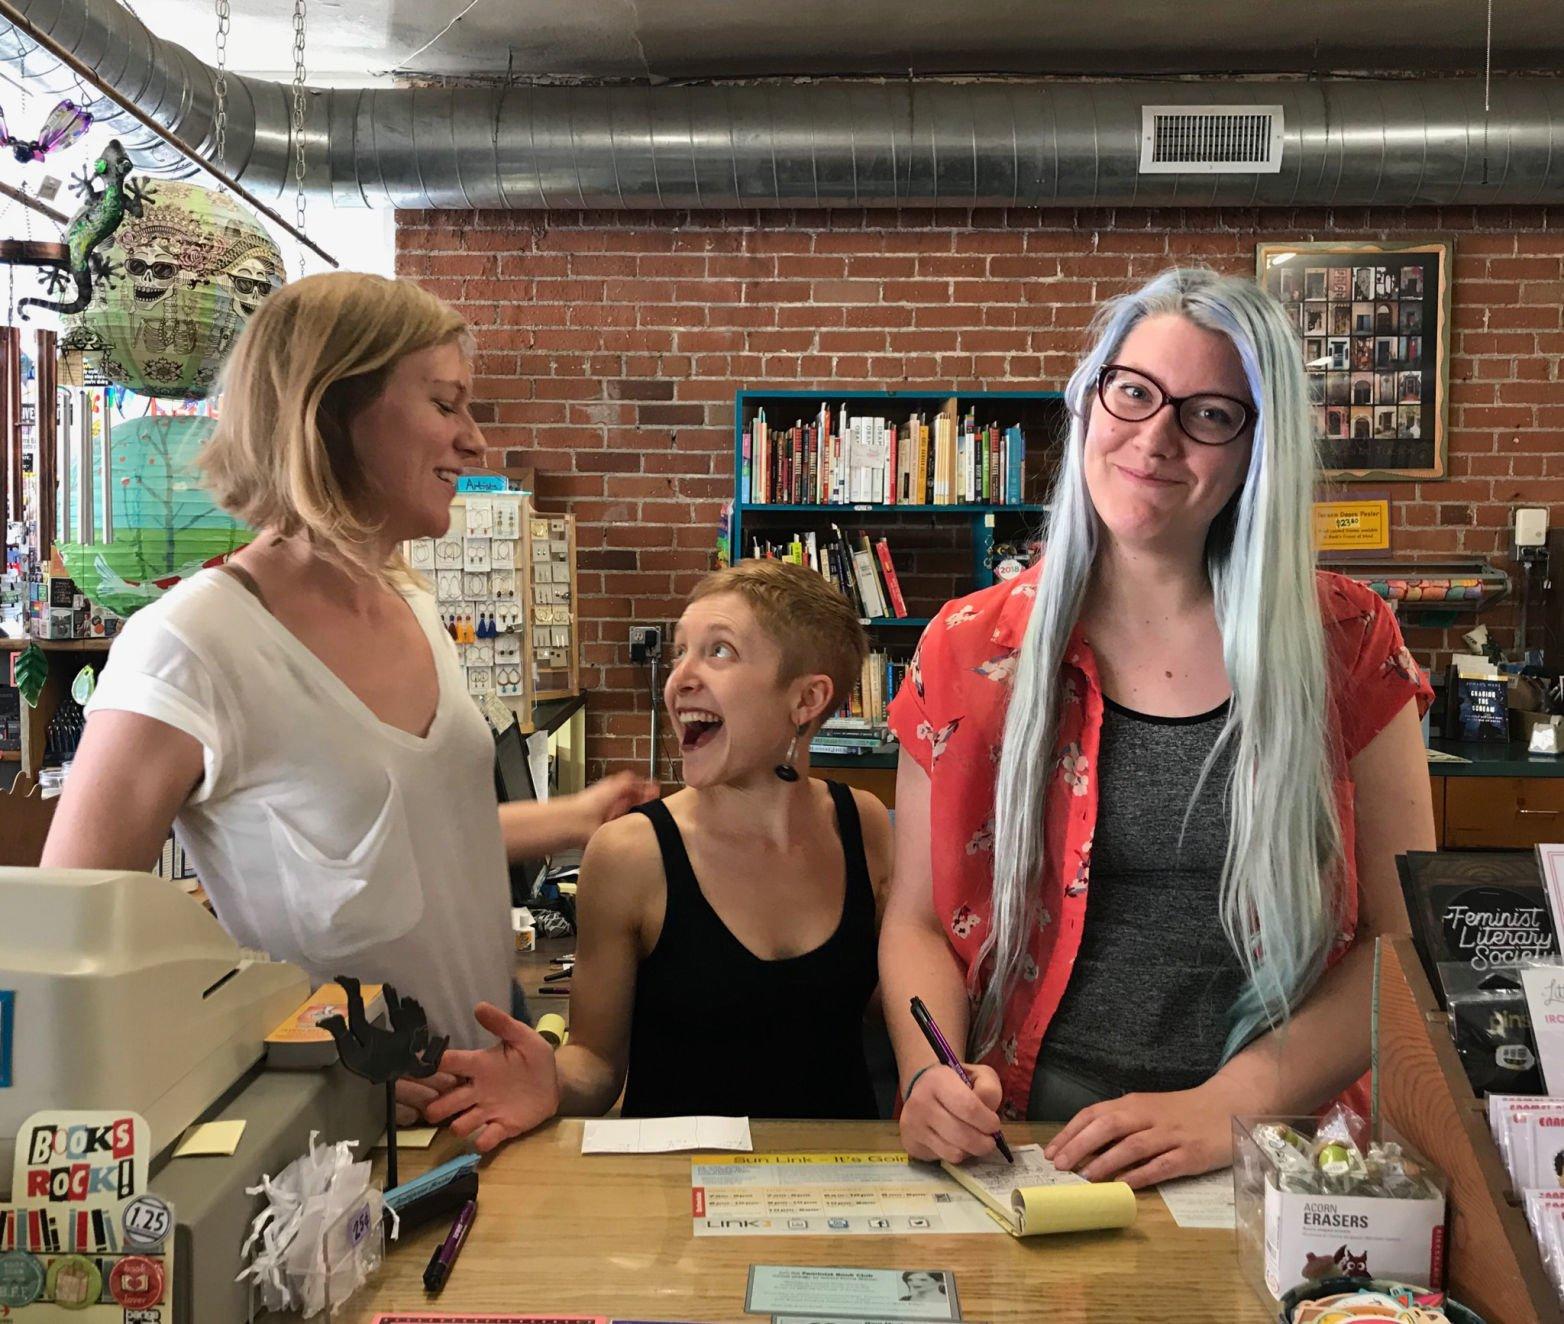 Antigone Books' employees quickly raise money from public, will buy store | Tucson.com